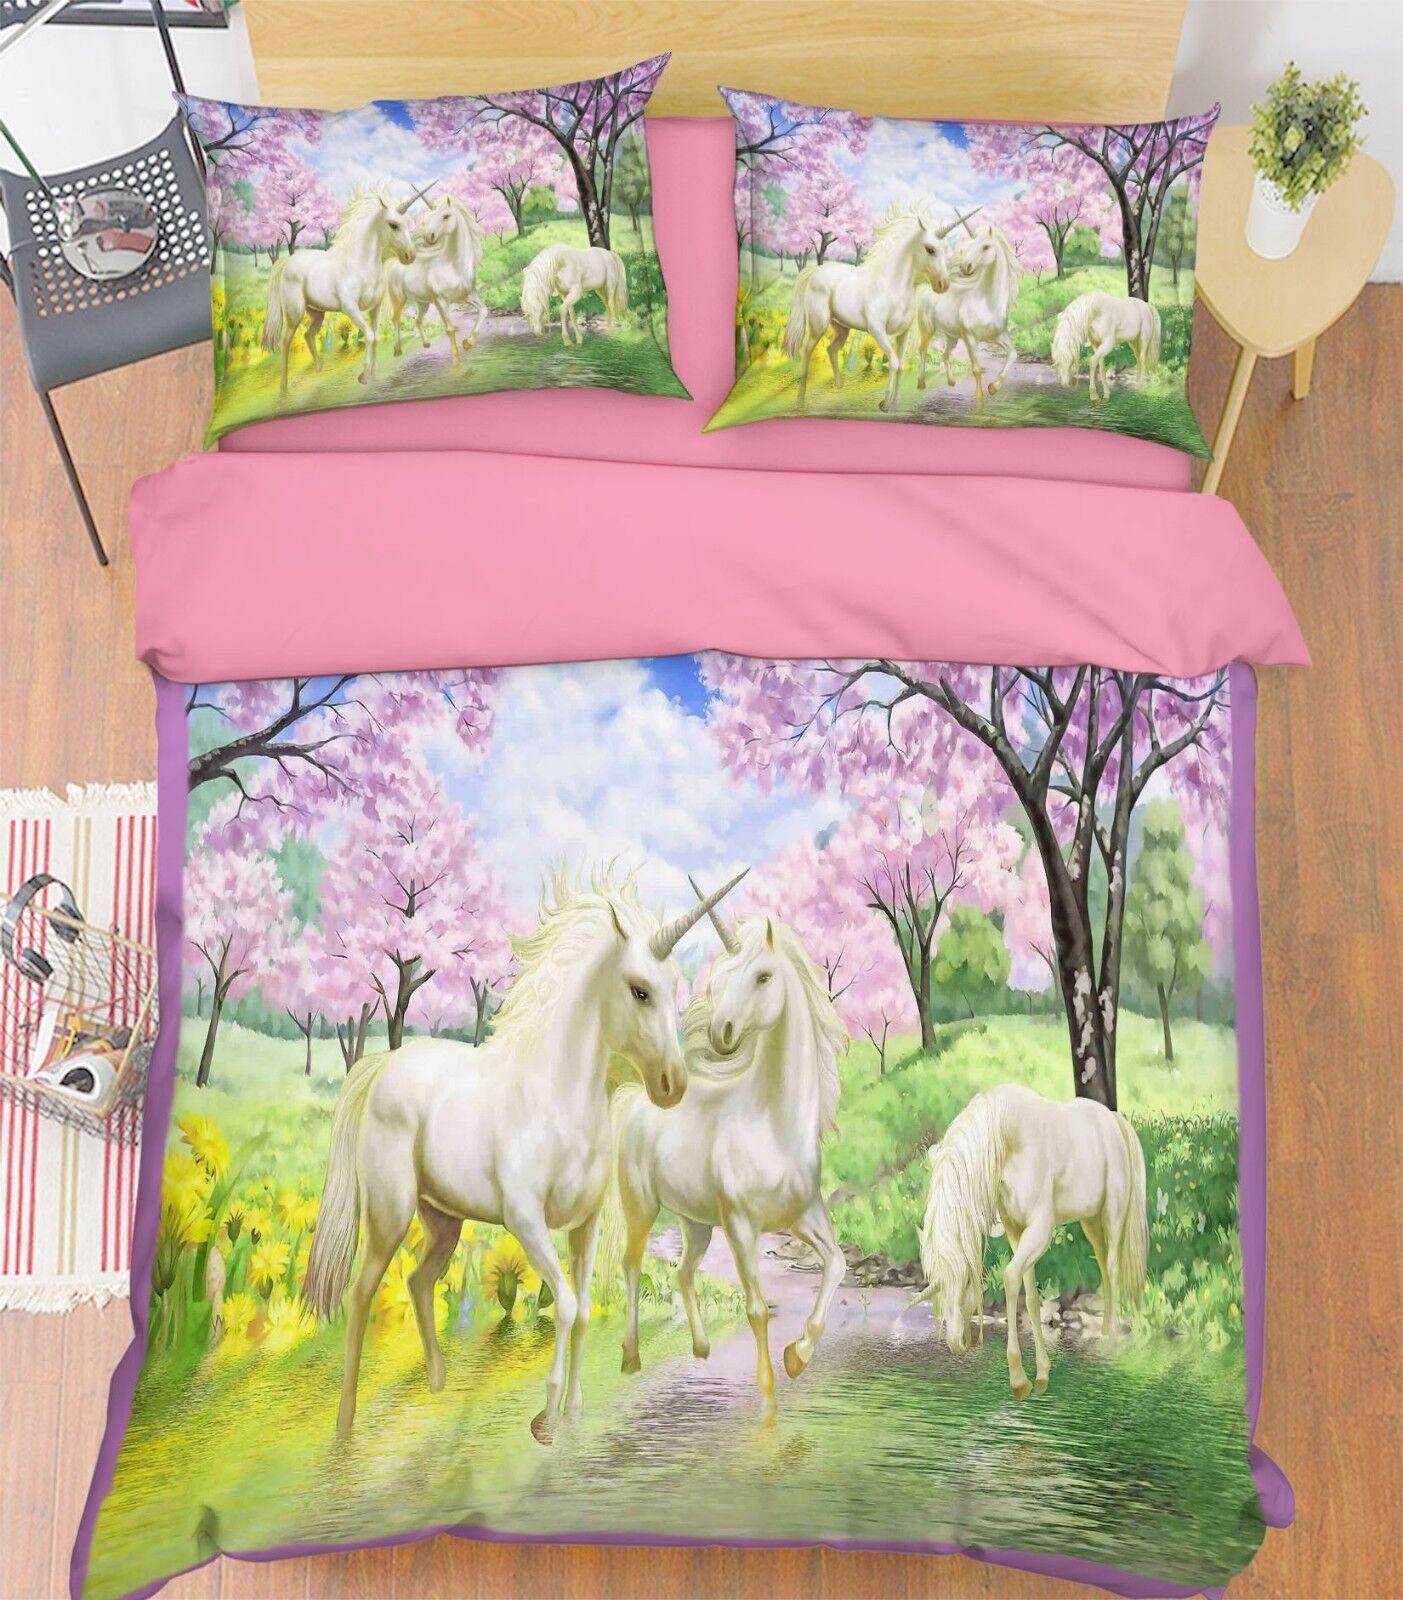 3D Wood Unicorn 740 Bed Pillowcases Quilt Duvet Cover Set Single Queen King CA